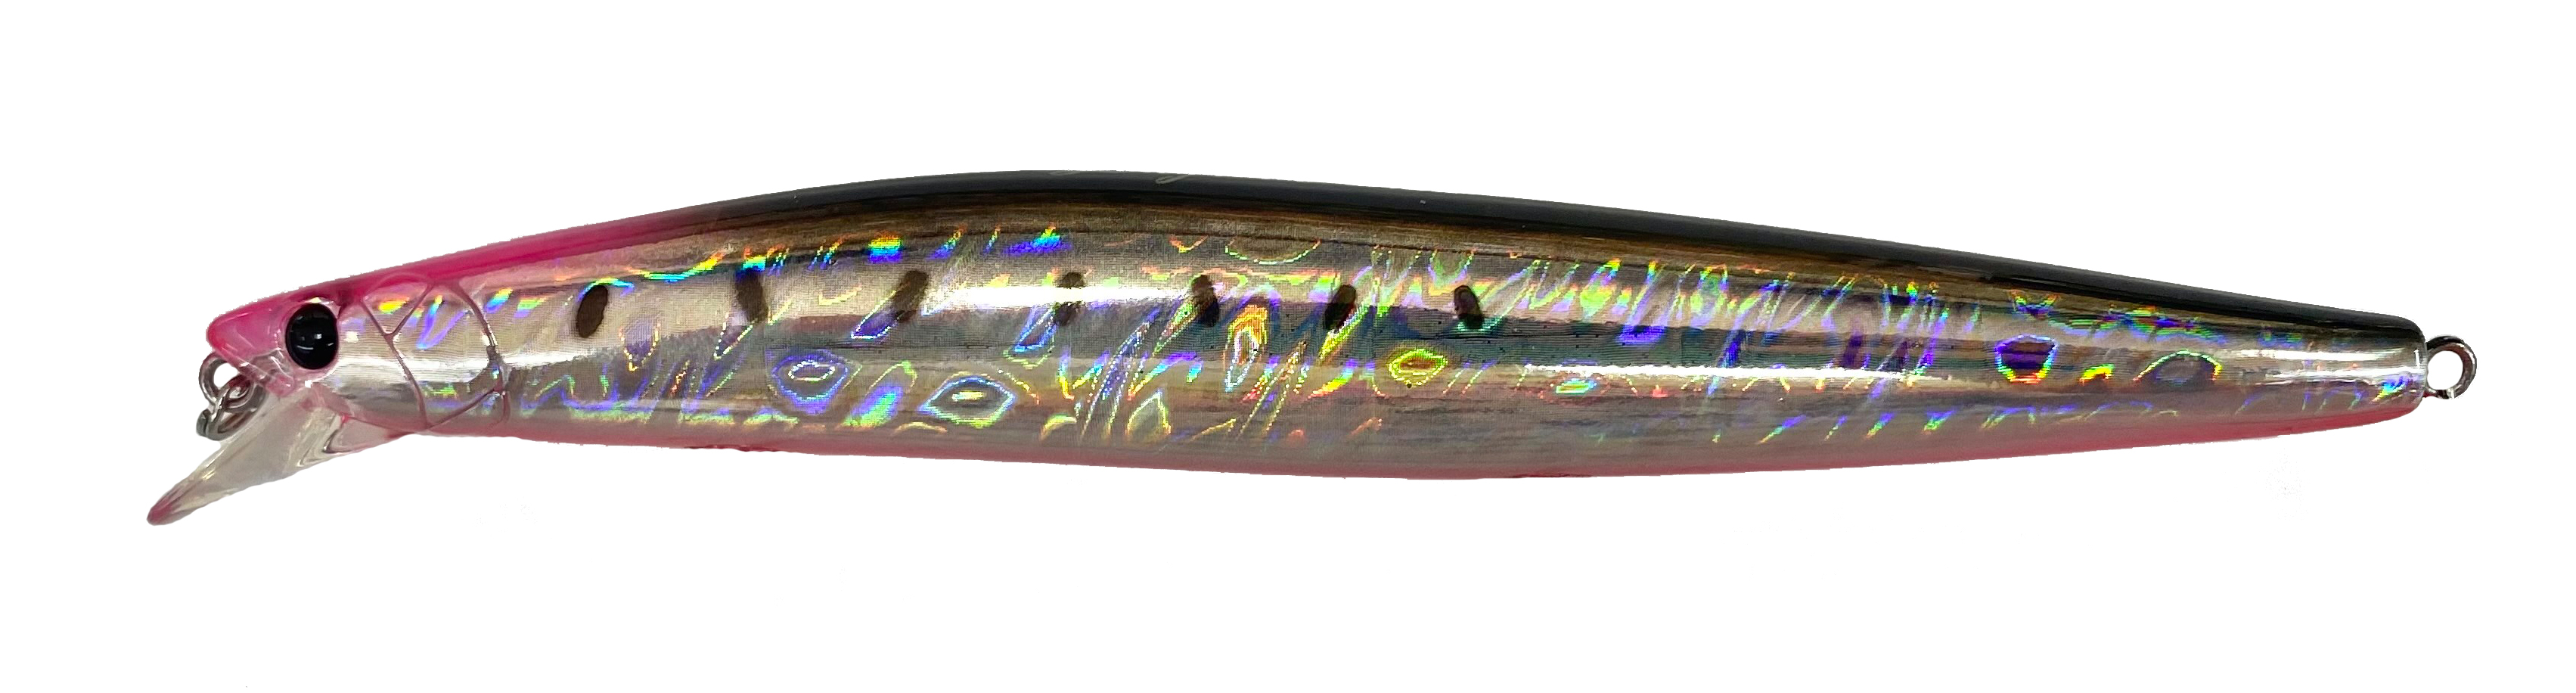 Tsurinoya lenguado 140mm 26g sinking minnow-A